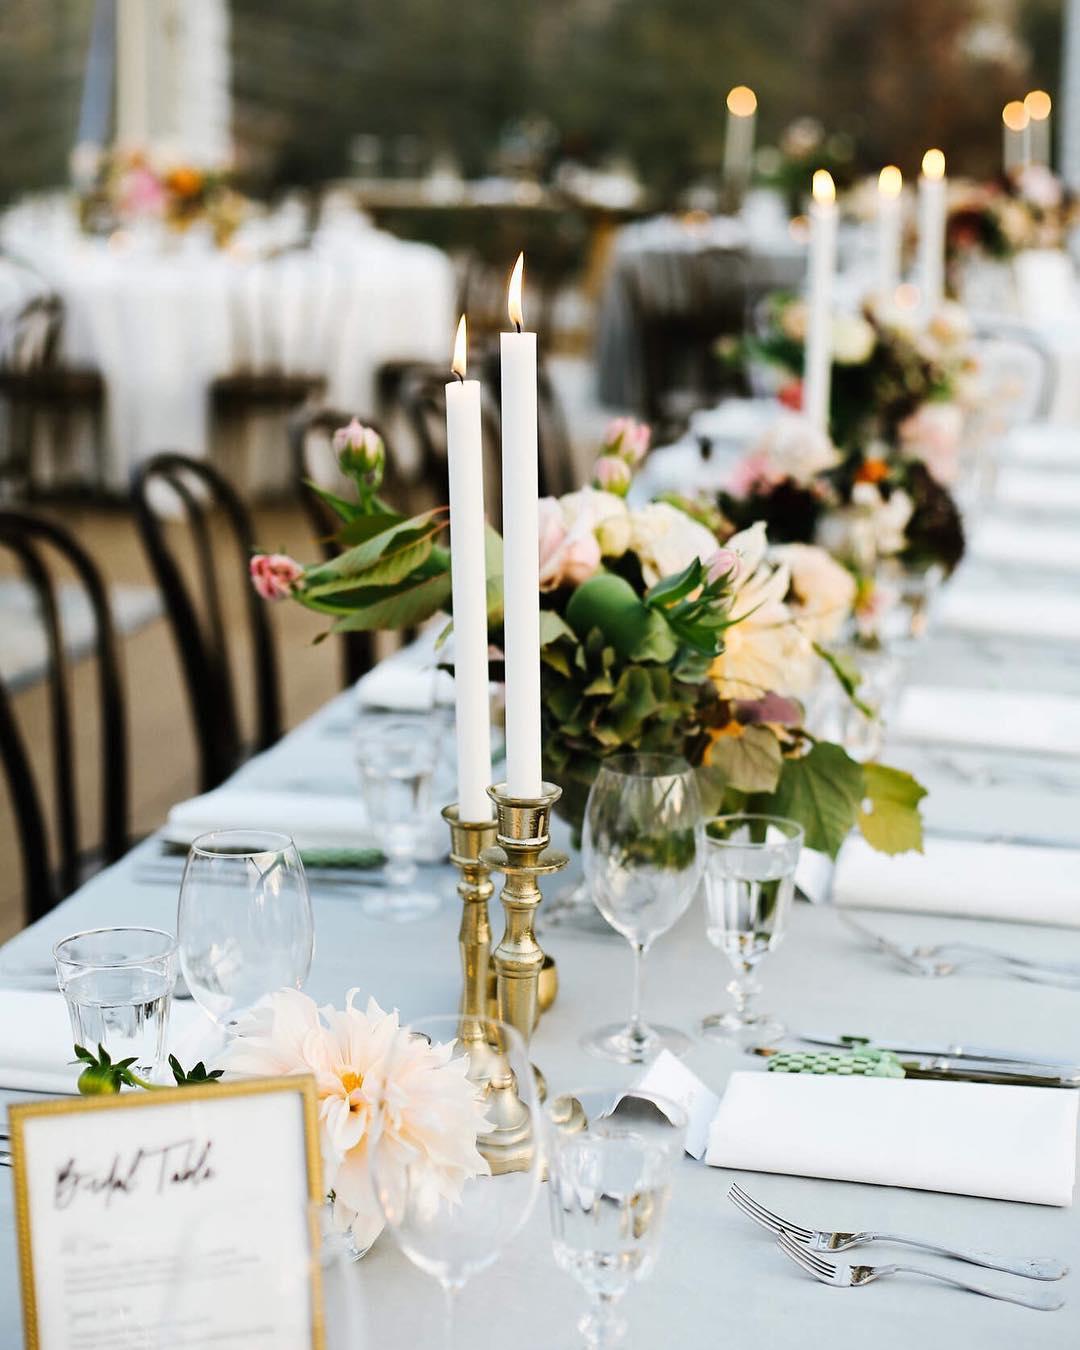 Spring Wedding Theming Ideas